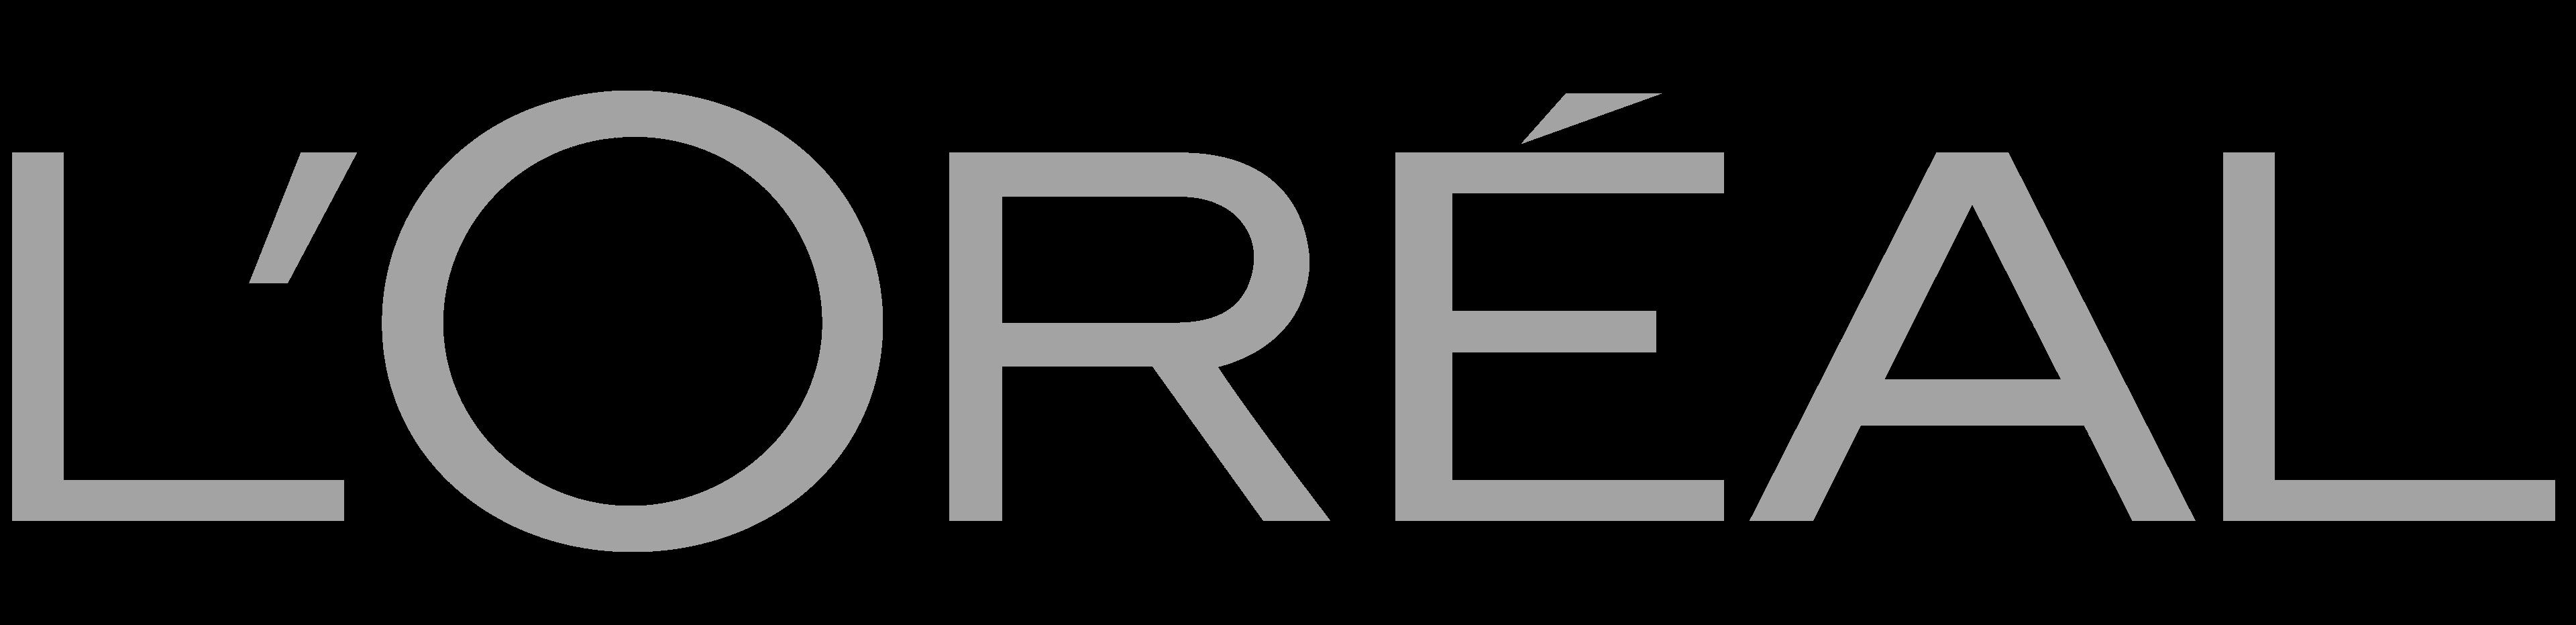 L'Oréal Logo conférence